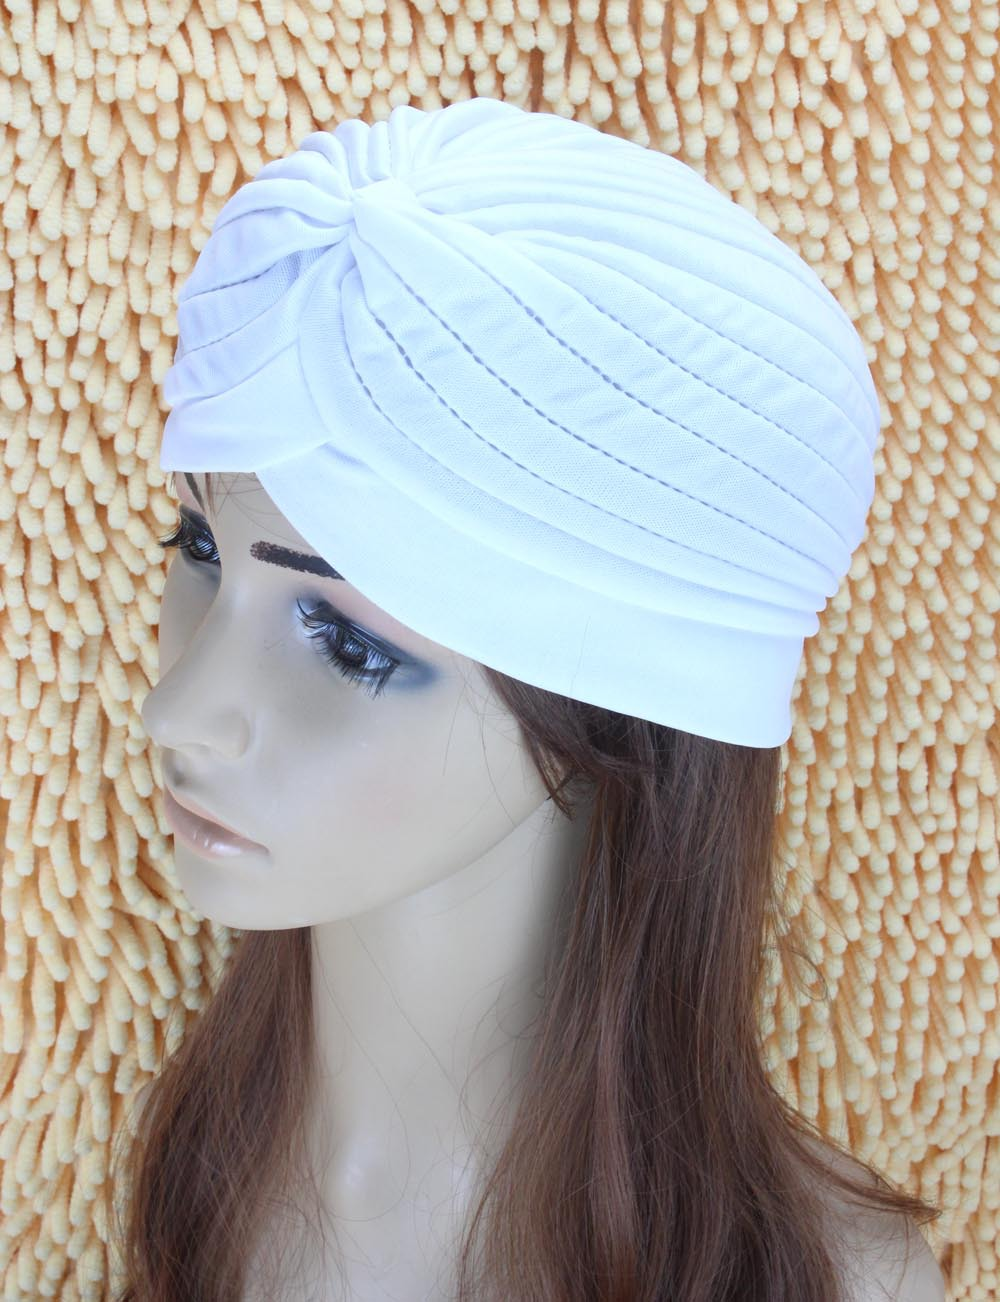 Mode Indian Unisex Head Wrap Cap vrouwen tulband Bandana indian caps - Kledingaccessoires - Foto 6